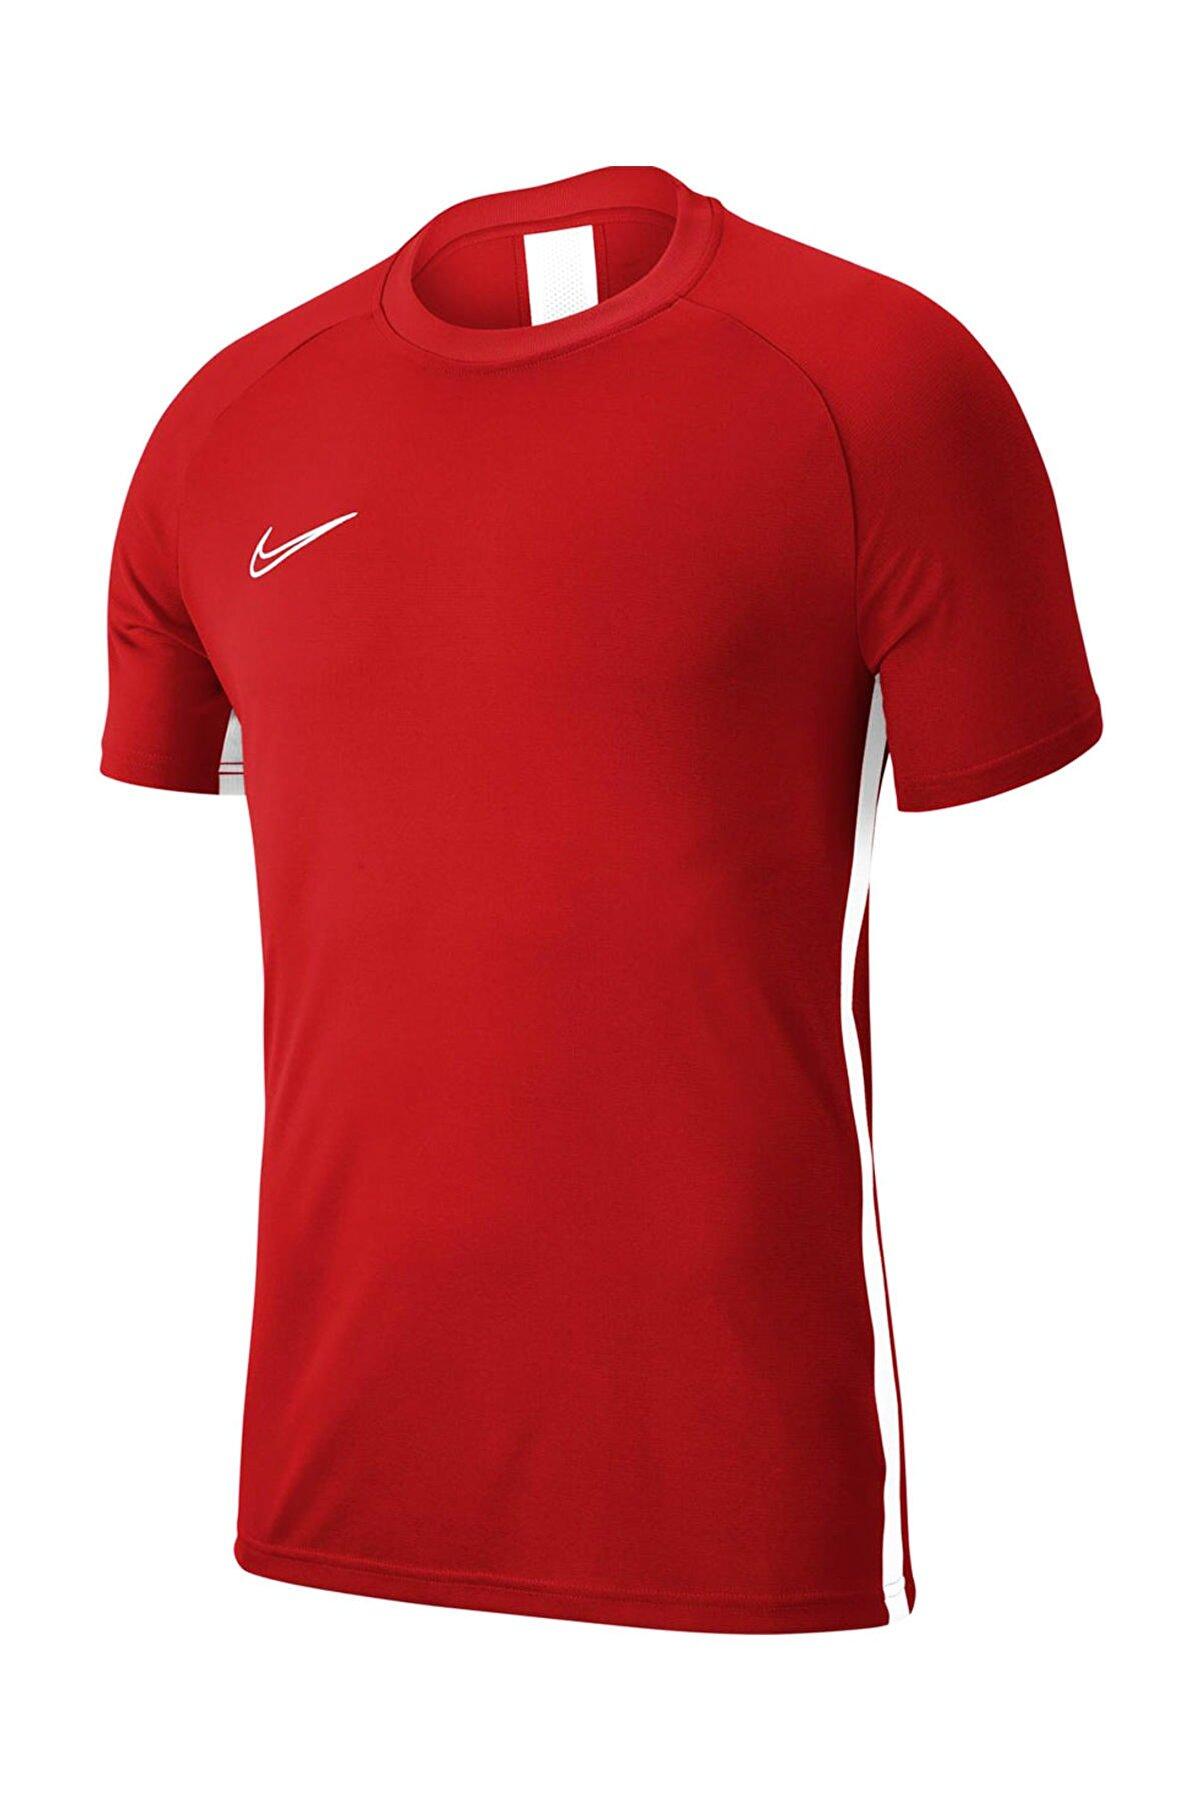 Nike Erkek T-shirt - M Nk Dry Acdmy19 Top Ss - AJ9088-657